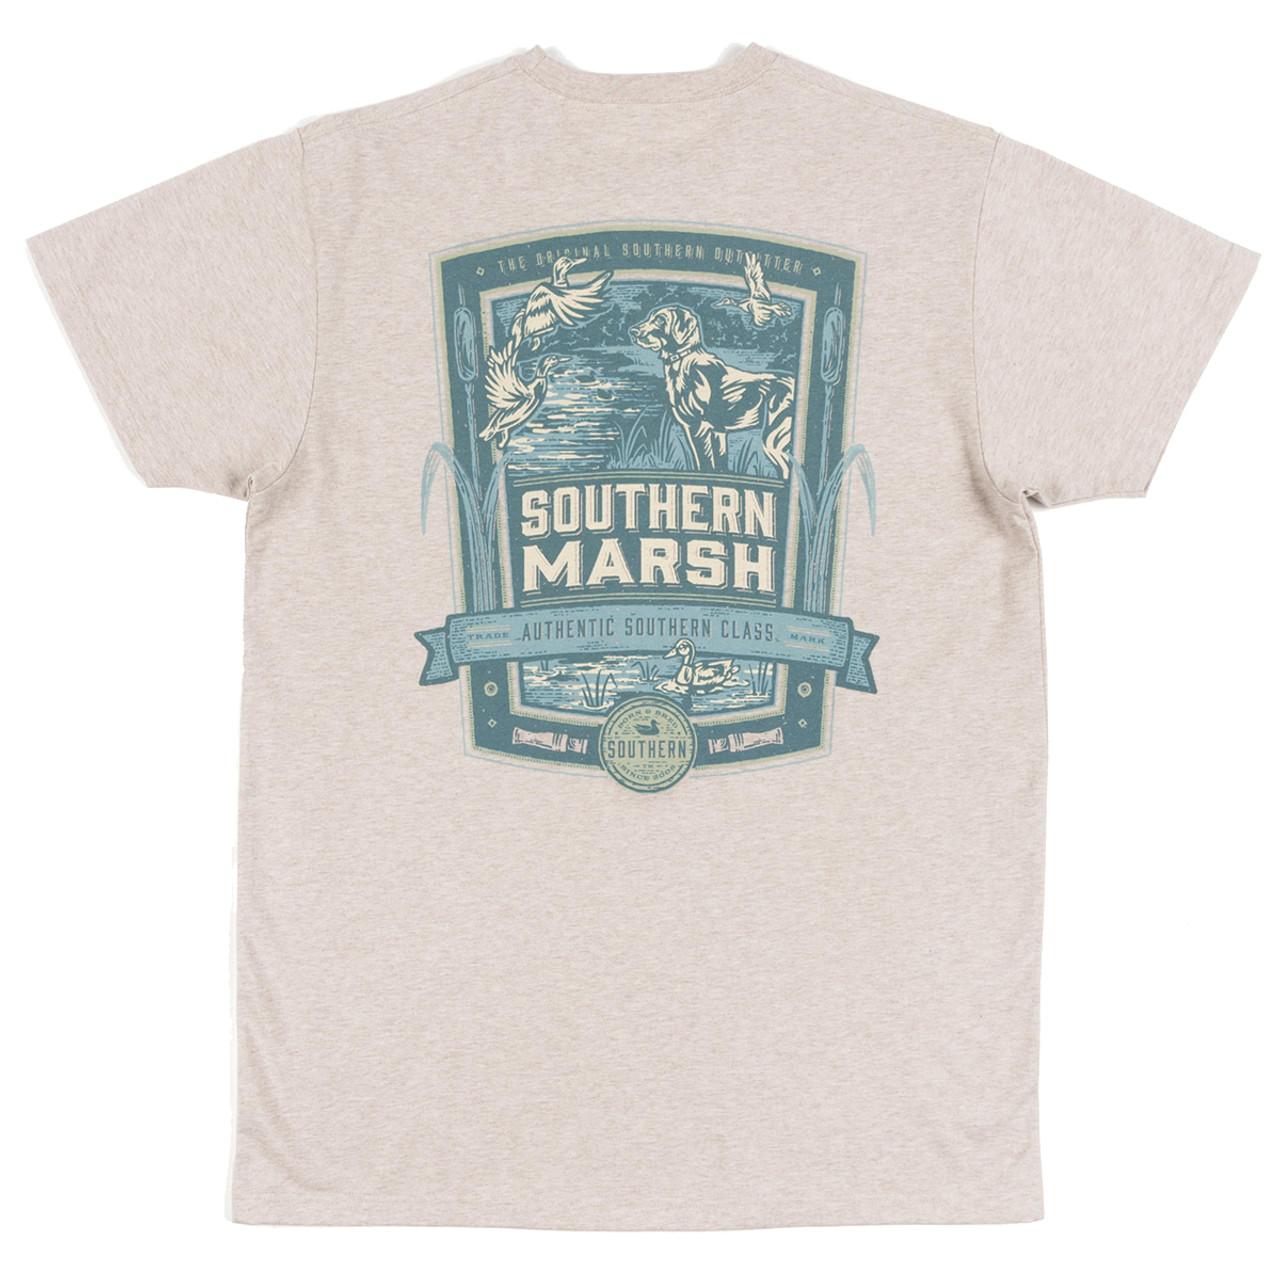 1ecd5ca1912f Southern Marsh Youth Genuine Duck Hunting Short Sleeve Tee - Trenz Shirt  Company